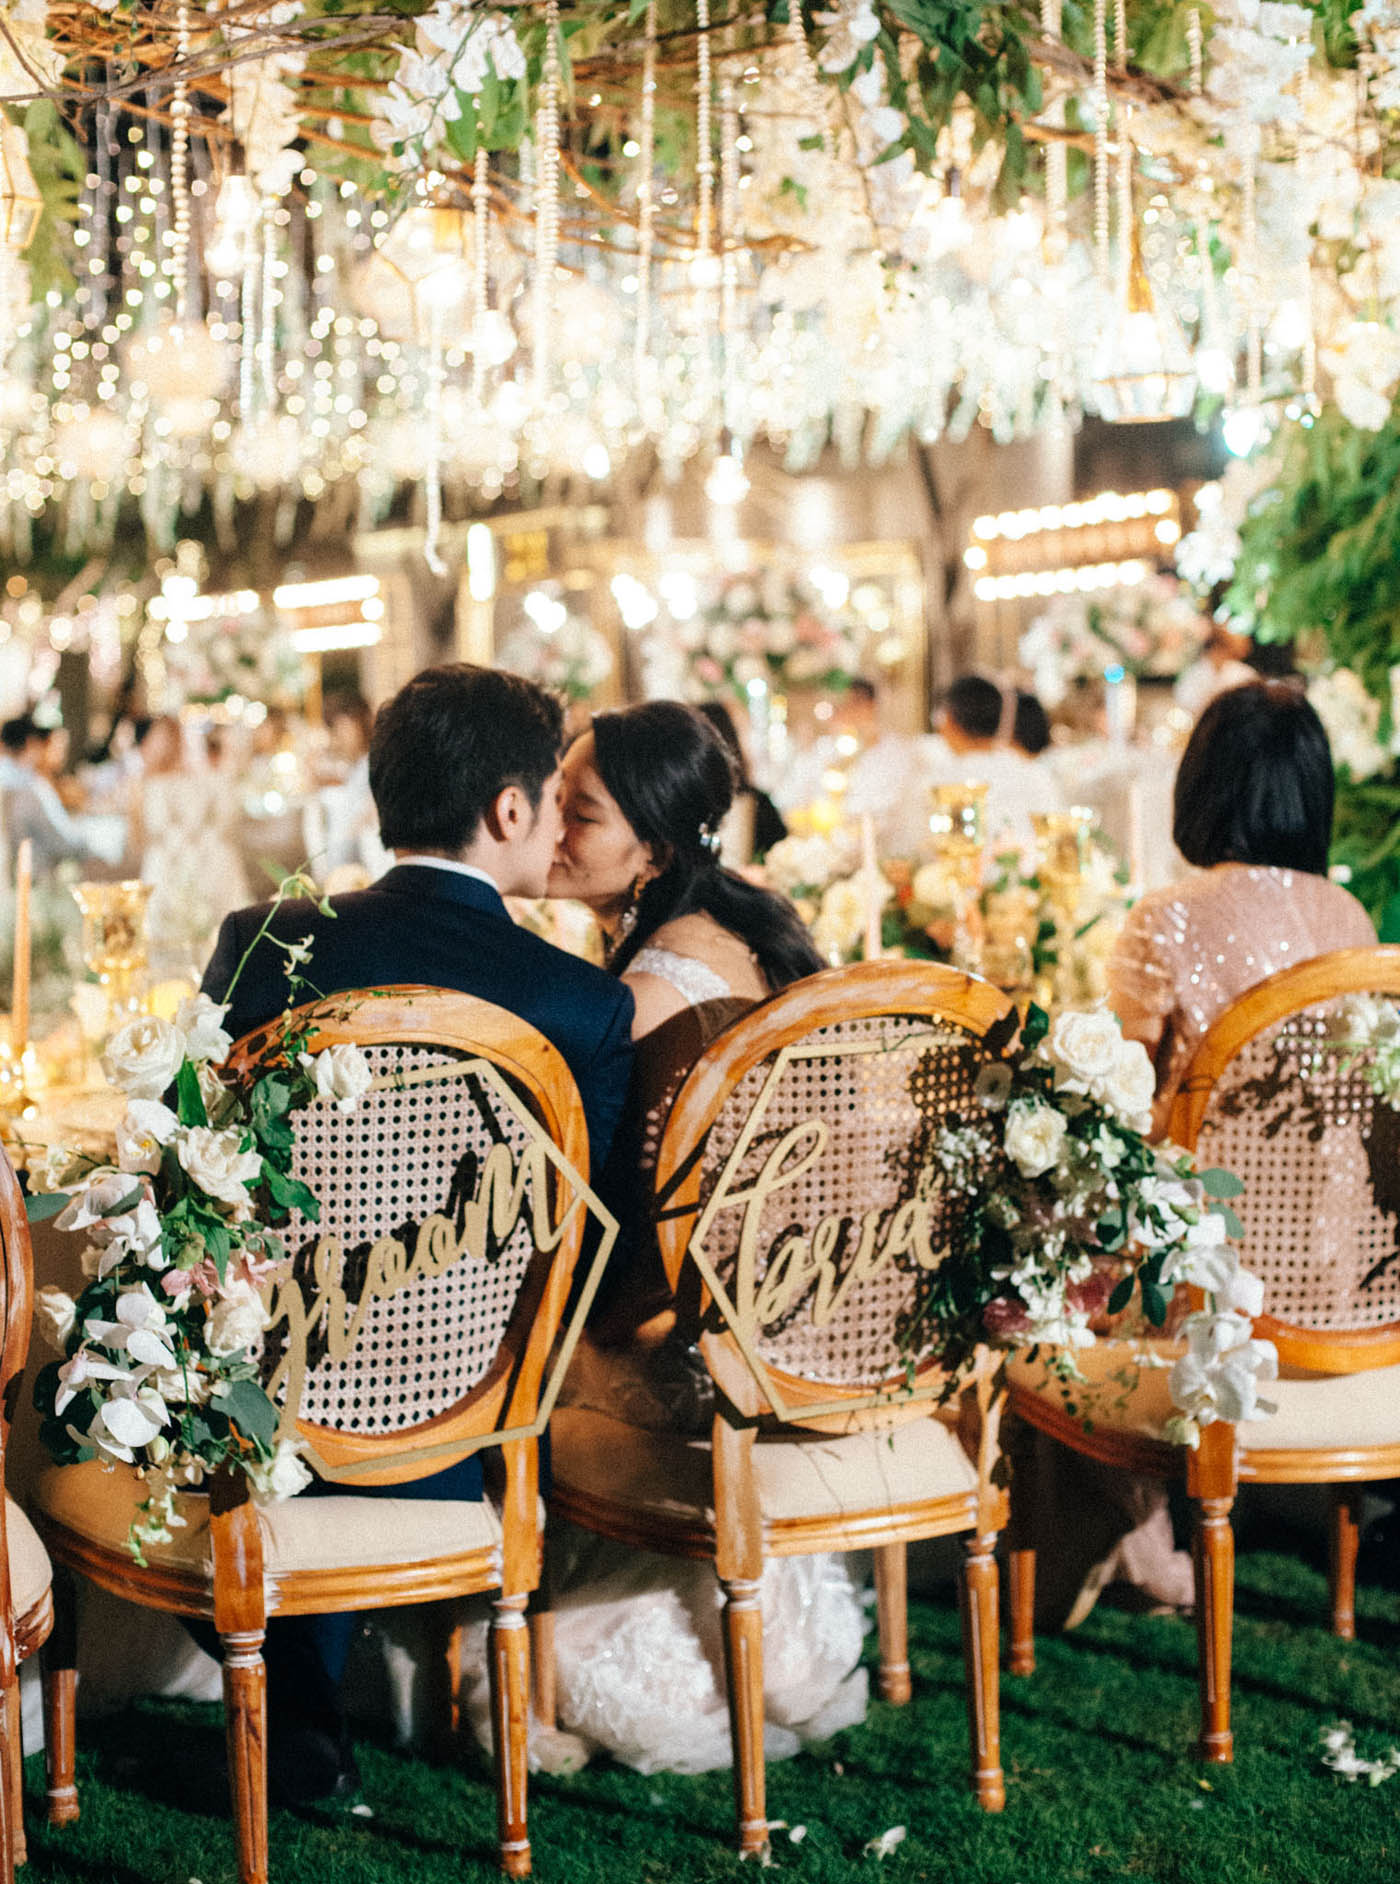 峇里島婚禮 Royal Santrian-STAGE-fine-art-film-wedding-海外